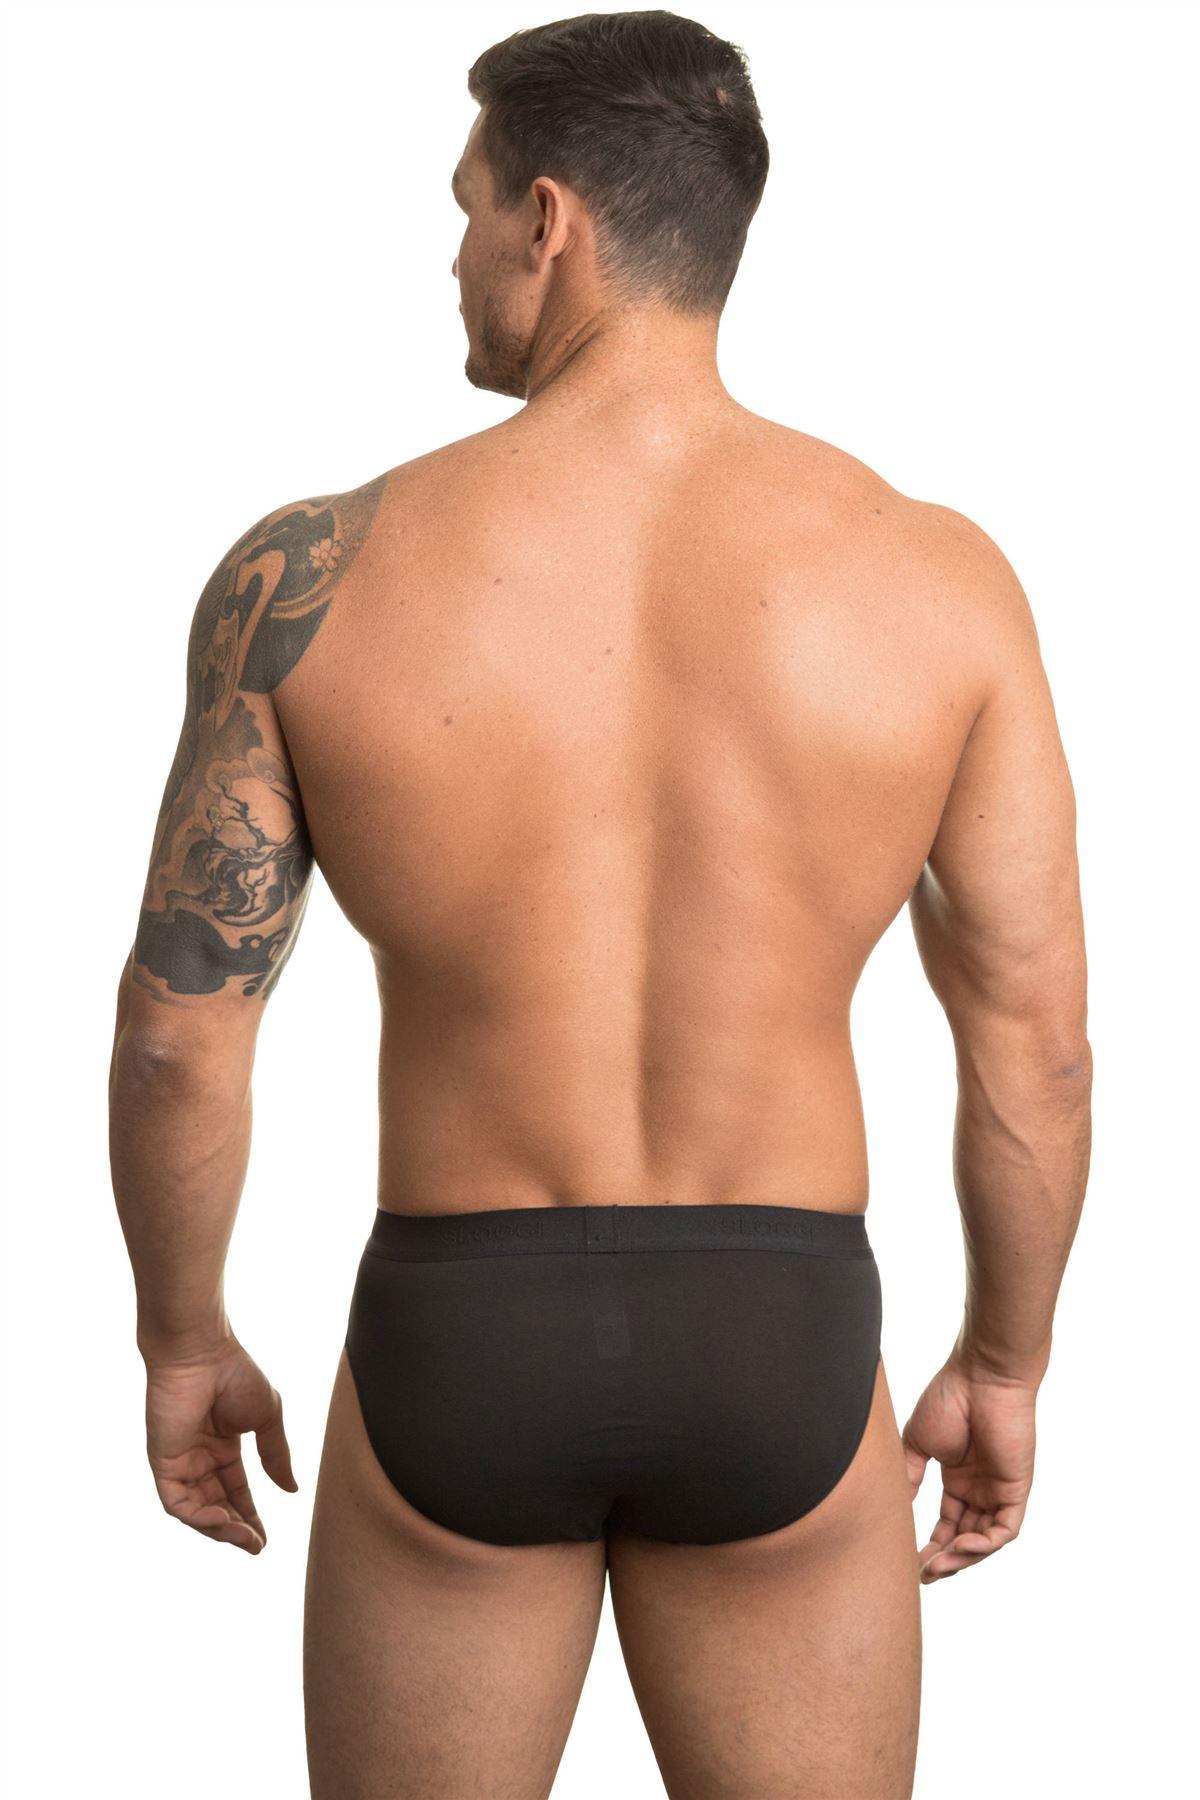 35965908 Details about Sloggi Men's 24/7 2-Pack Midi Brief, Slip 4 COLOURS Multipack  Underwear